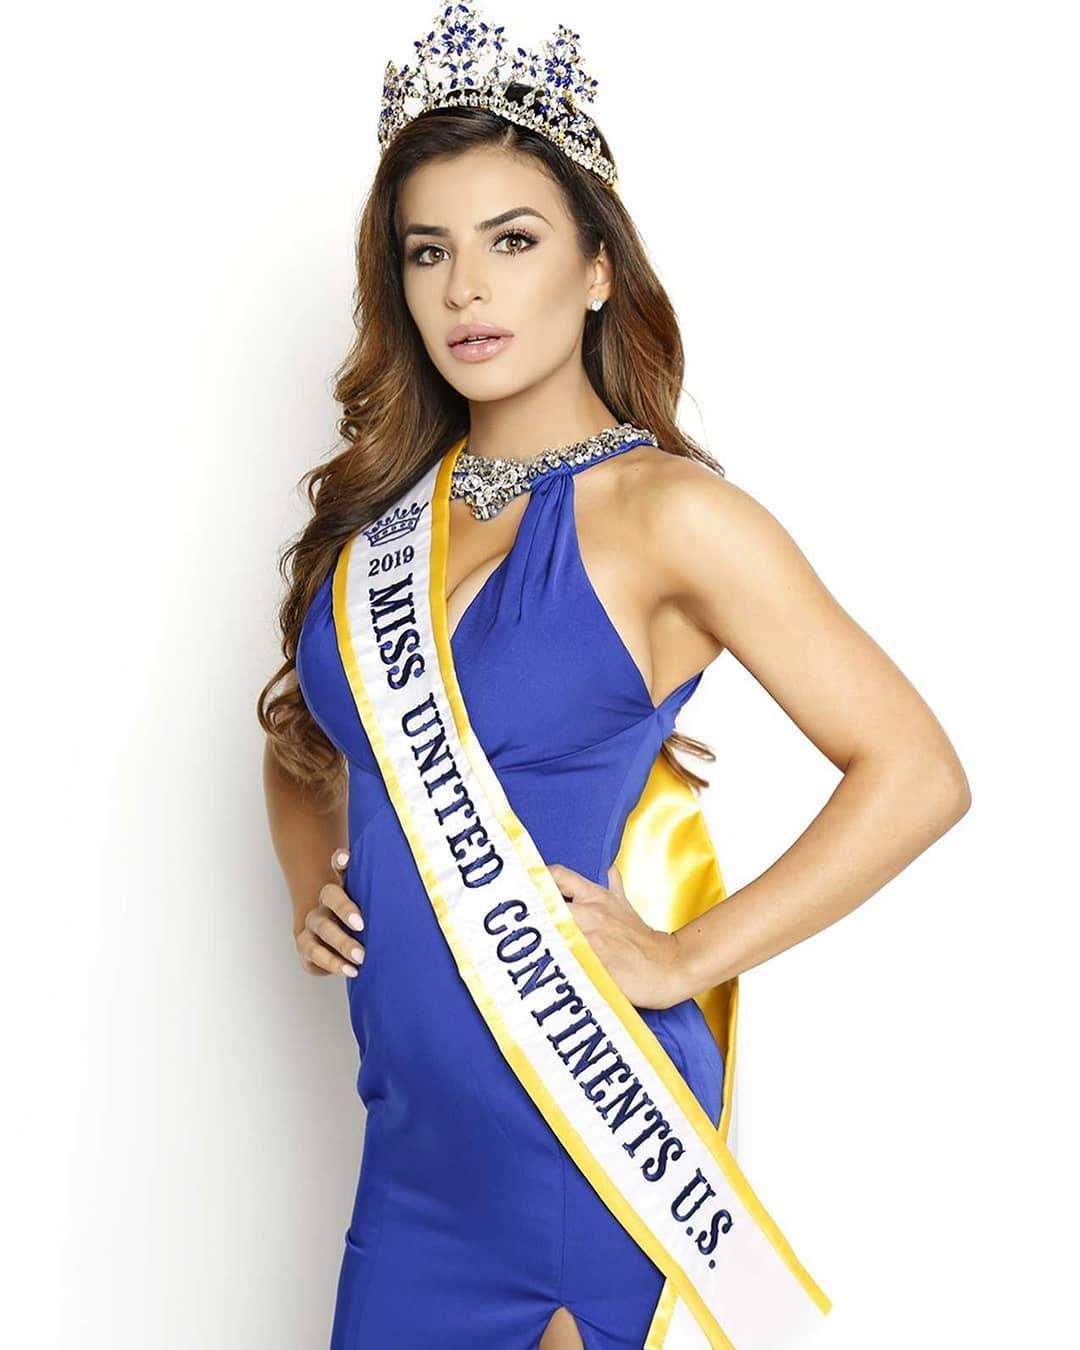 maria elena manzo, miss united continents us 2019. 52407412